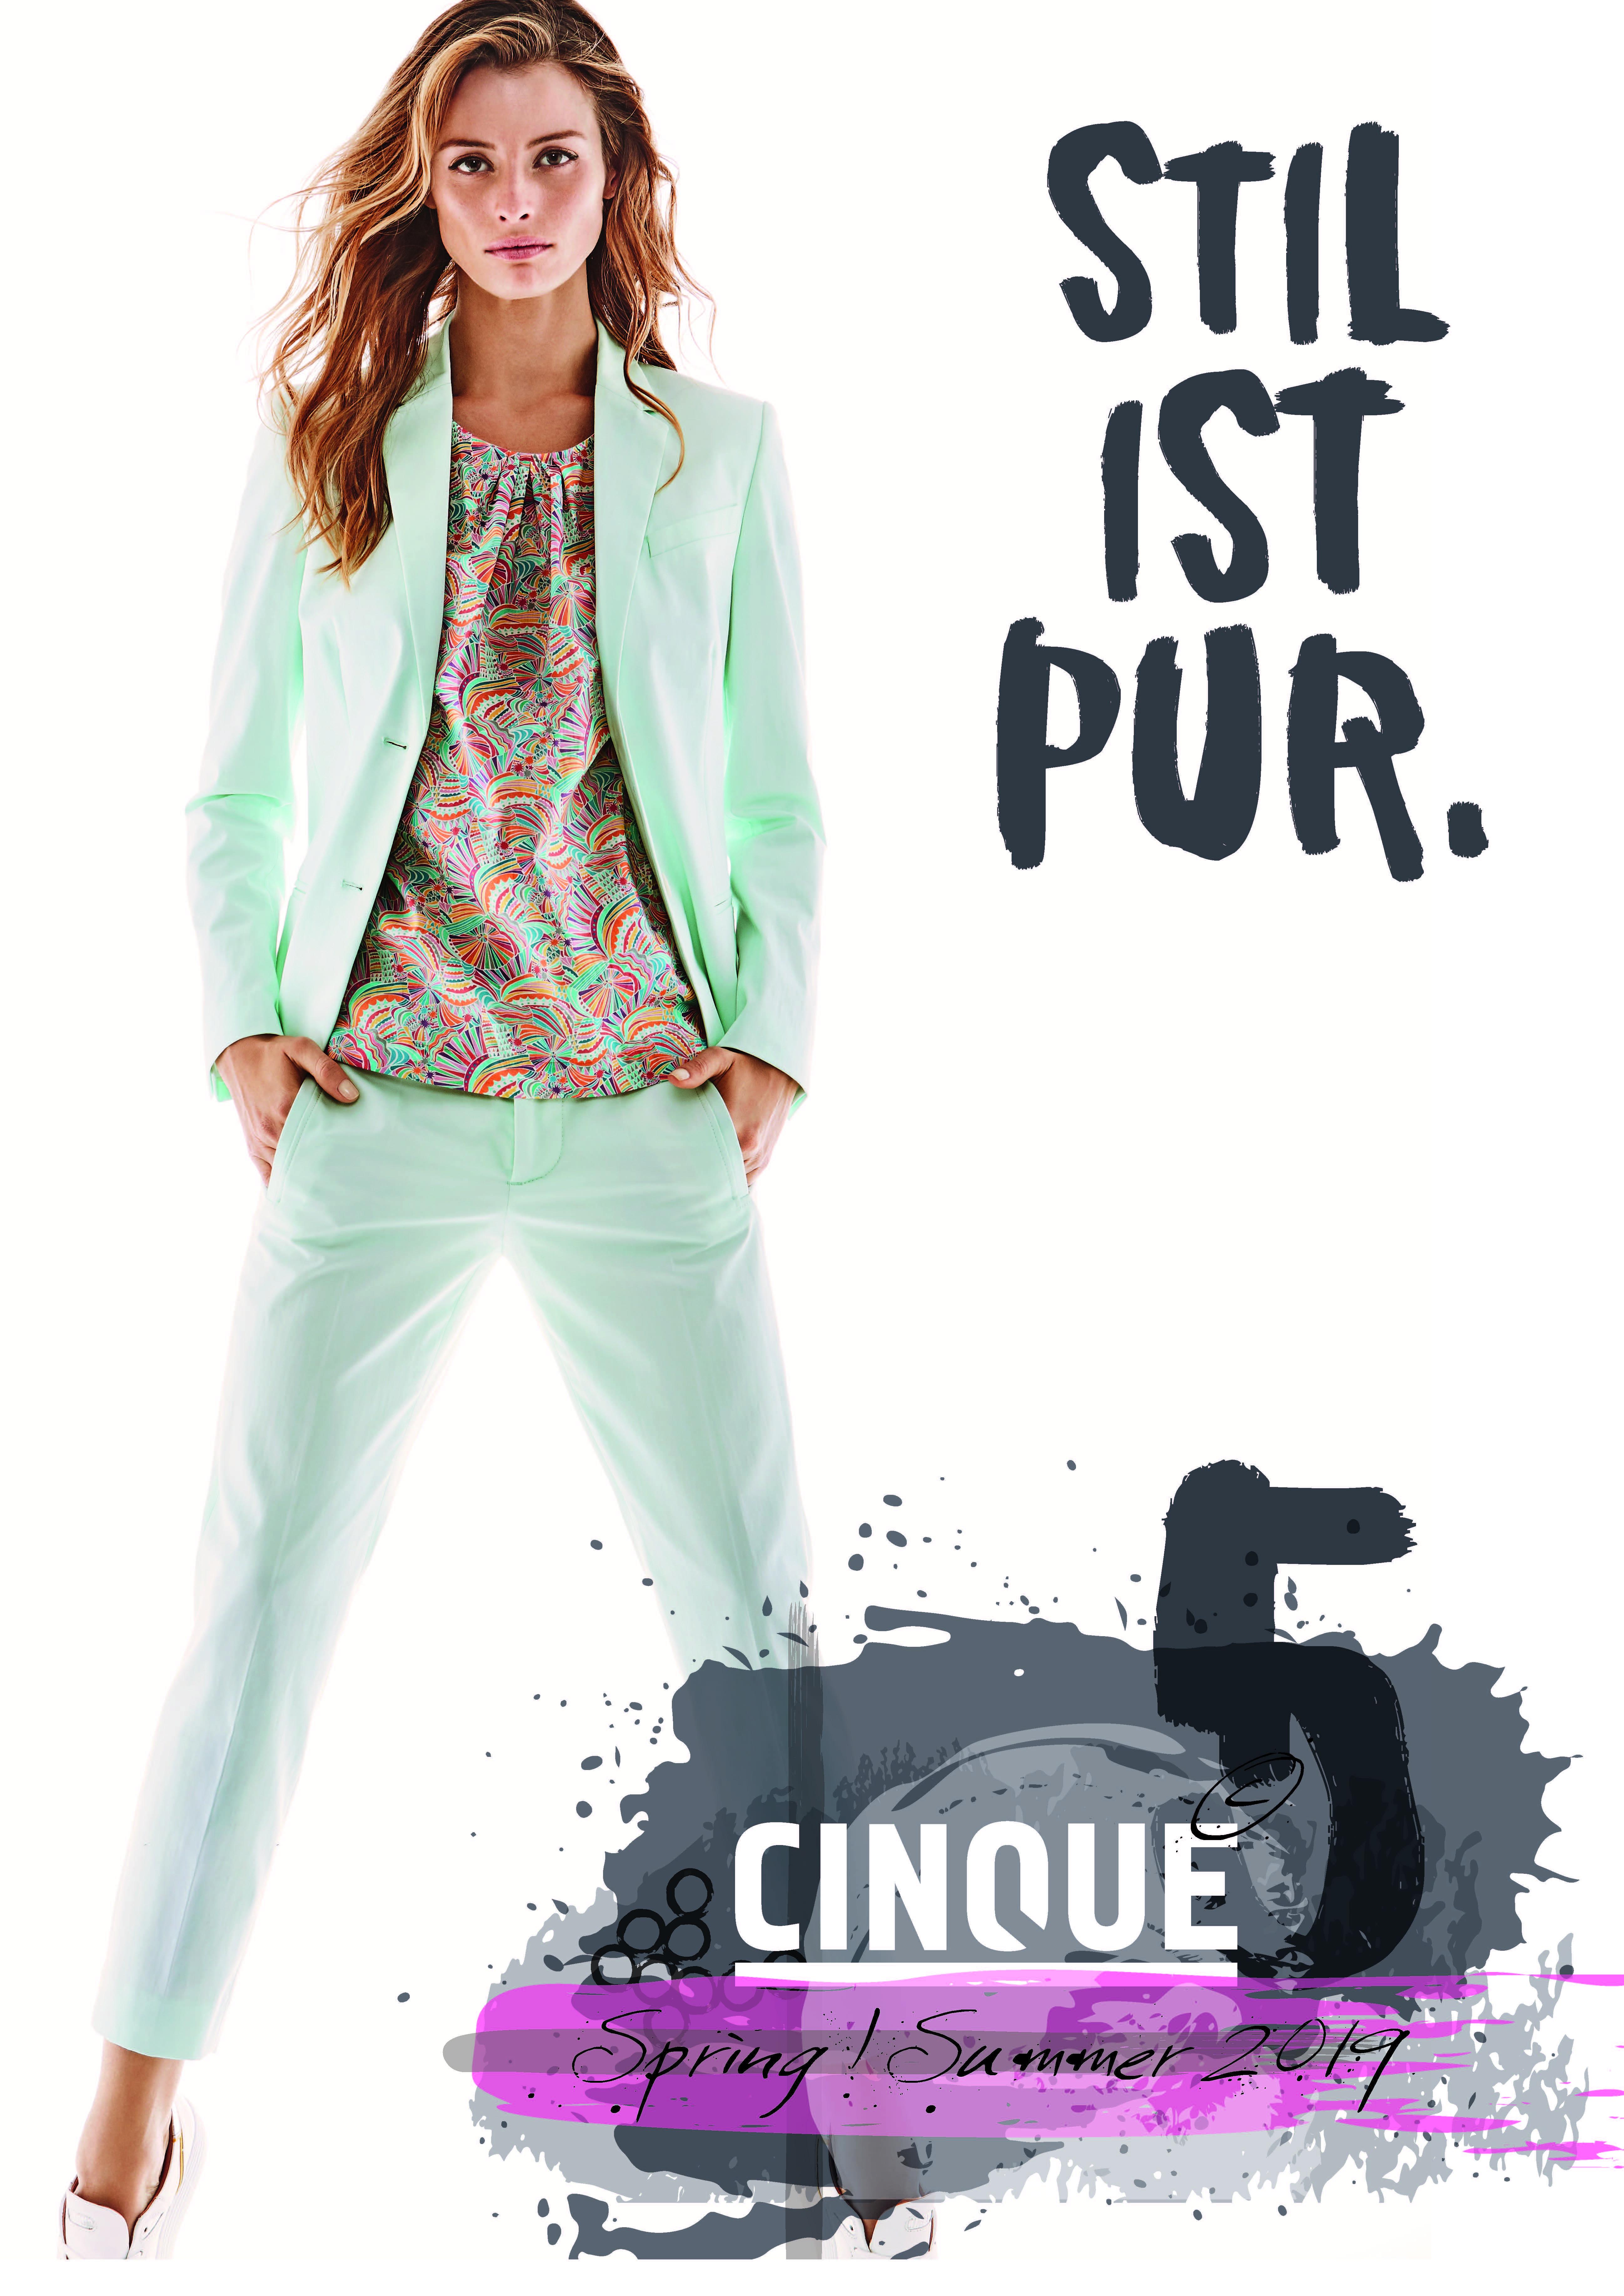 CINQUE_spring_summer_2019_original_CIN_DOB_Look_10_2905-STIL-IST-PUR-297X420MM+B